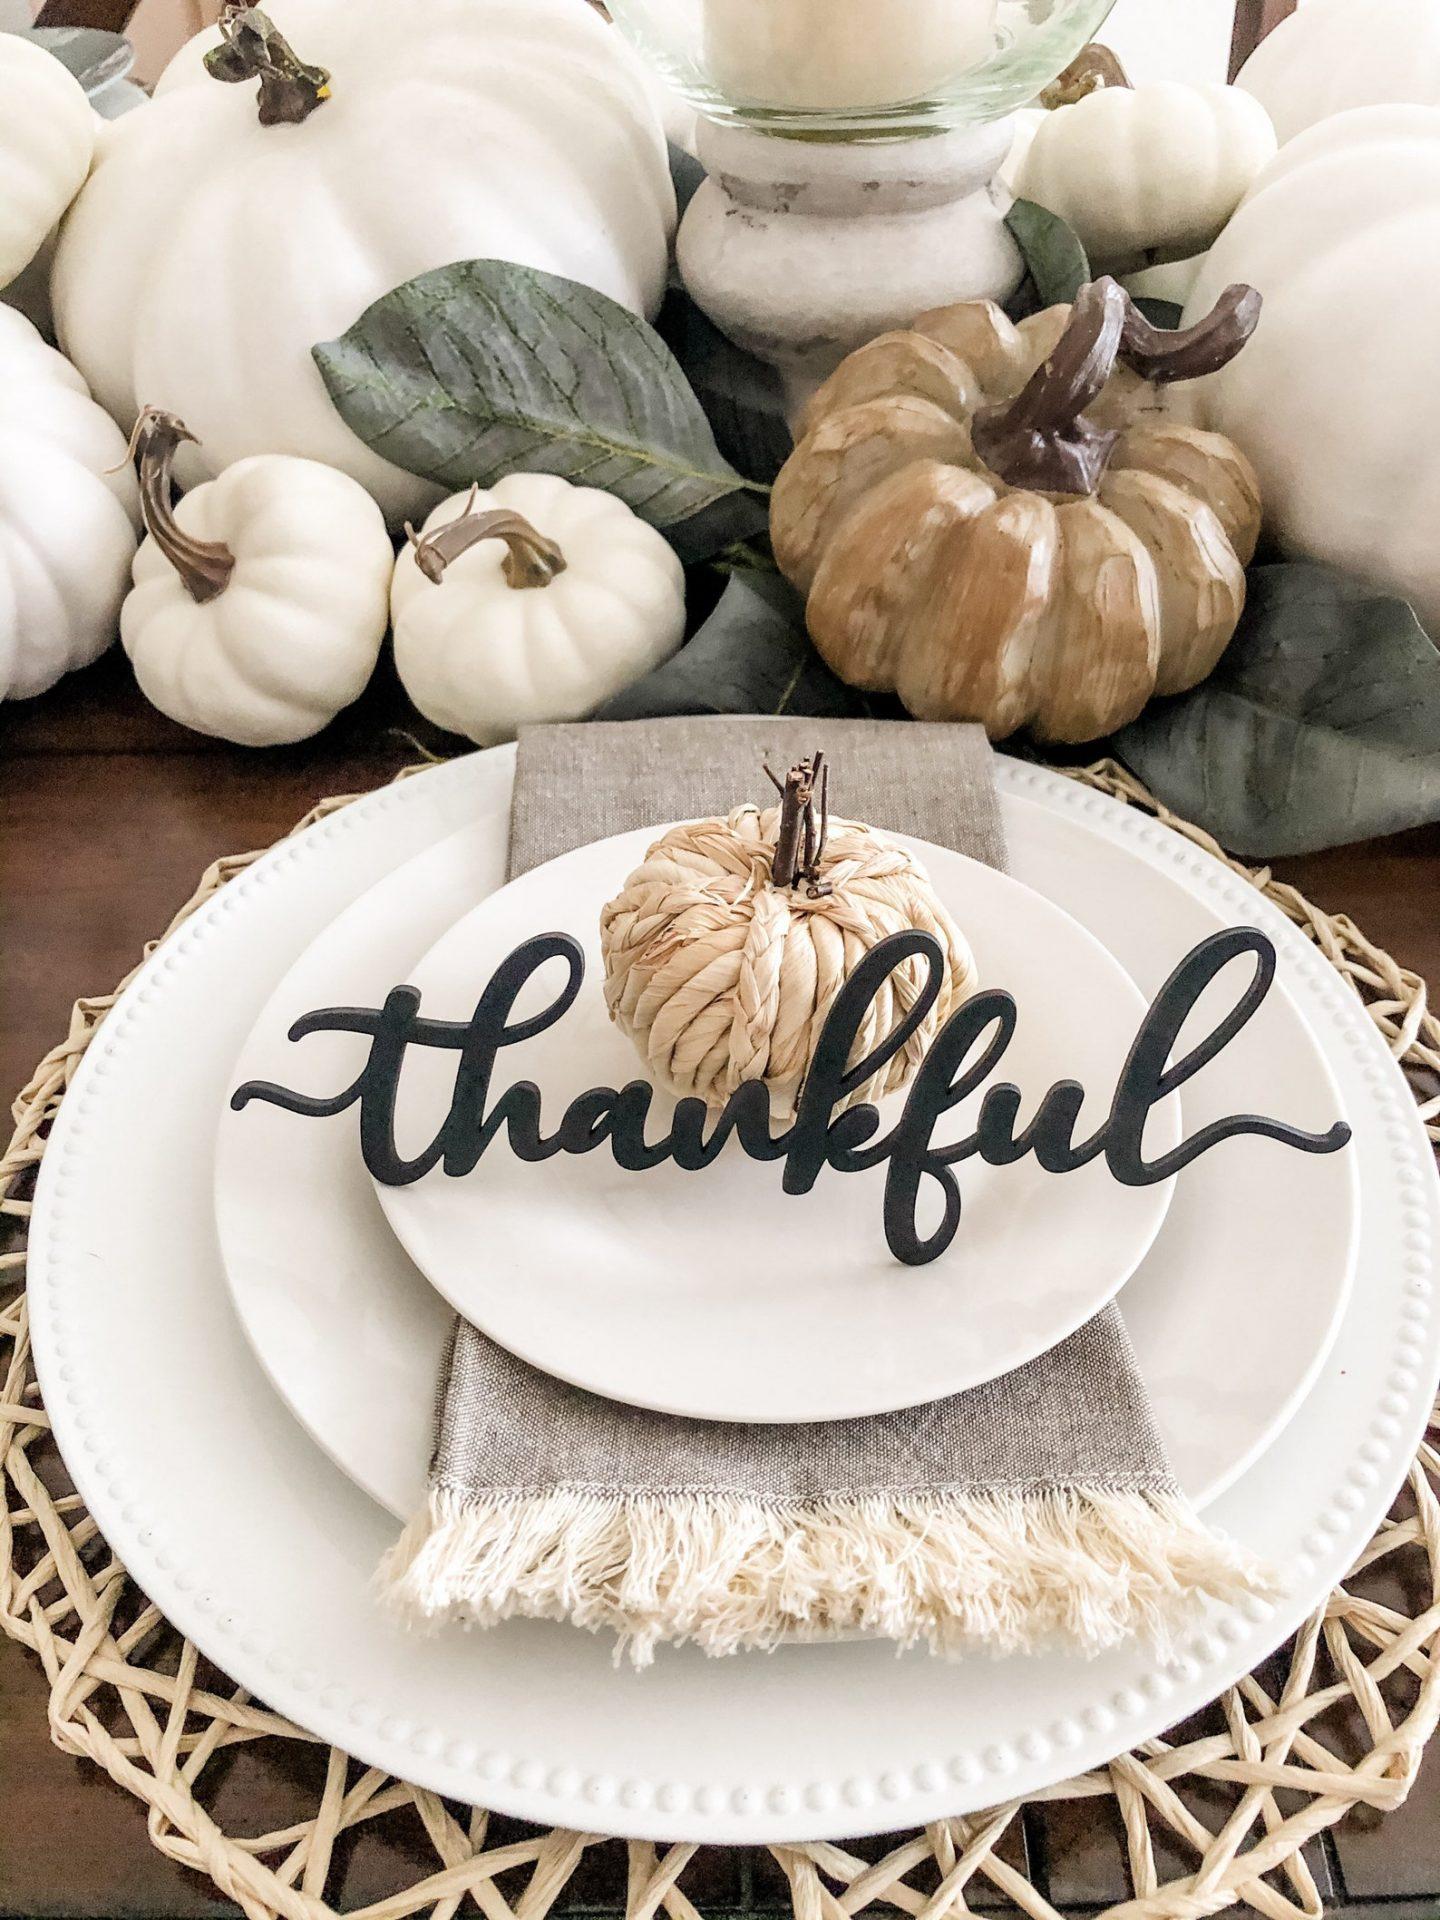 Elegant Thanksgiving table settings with white pumpkins